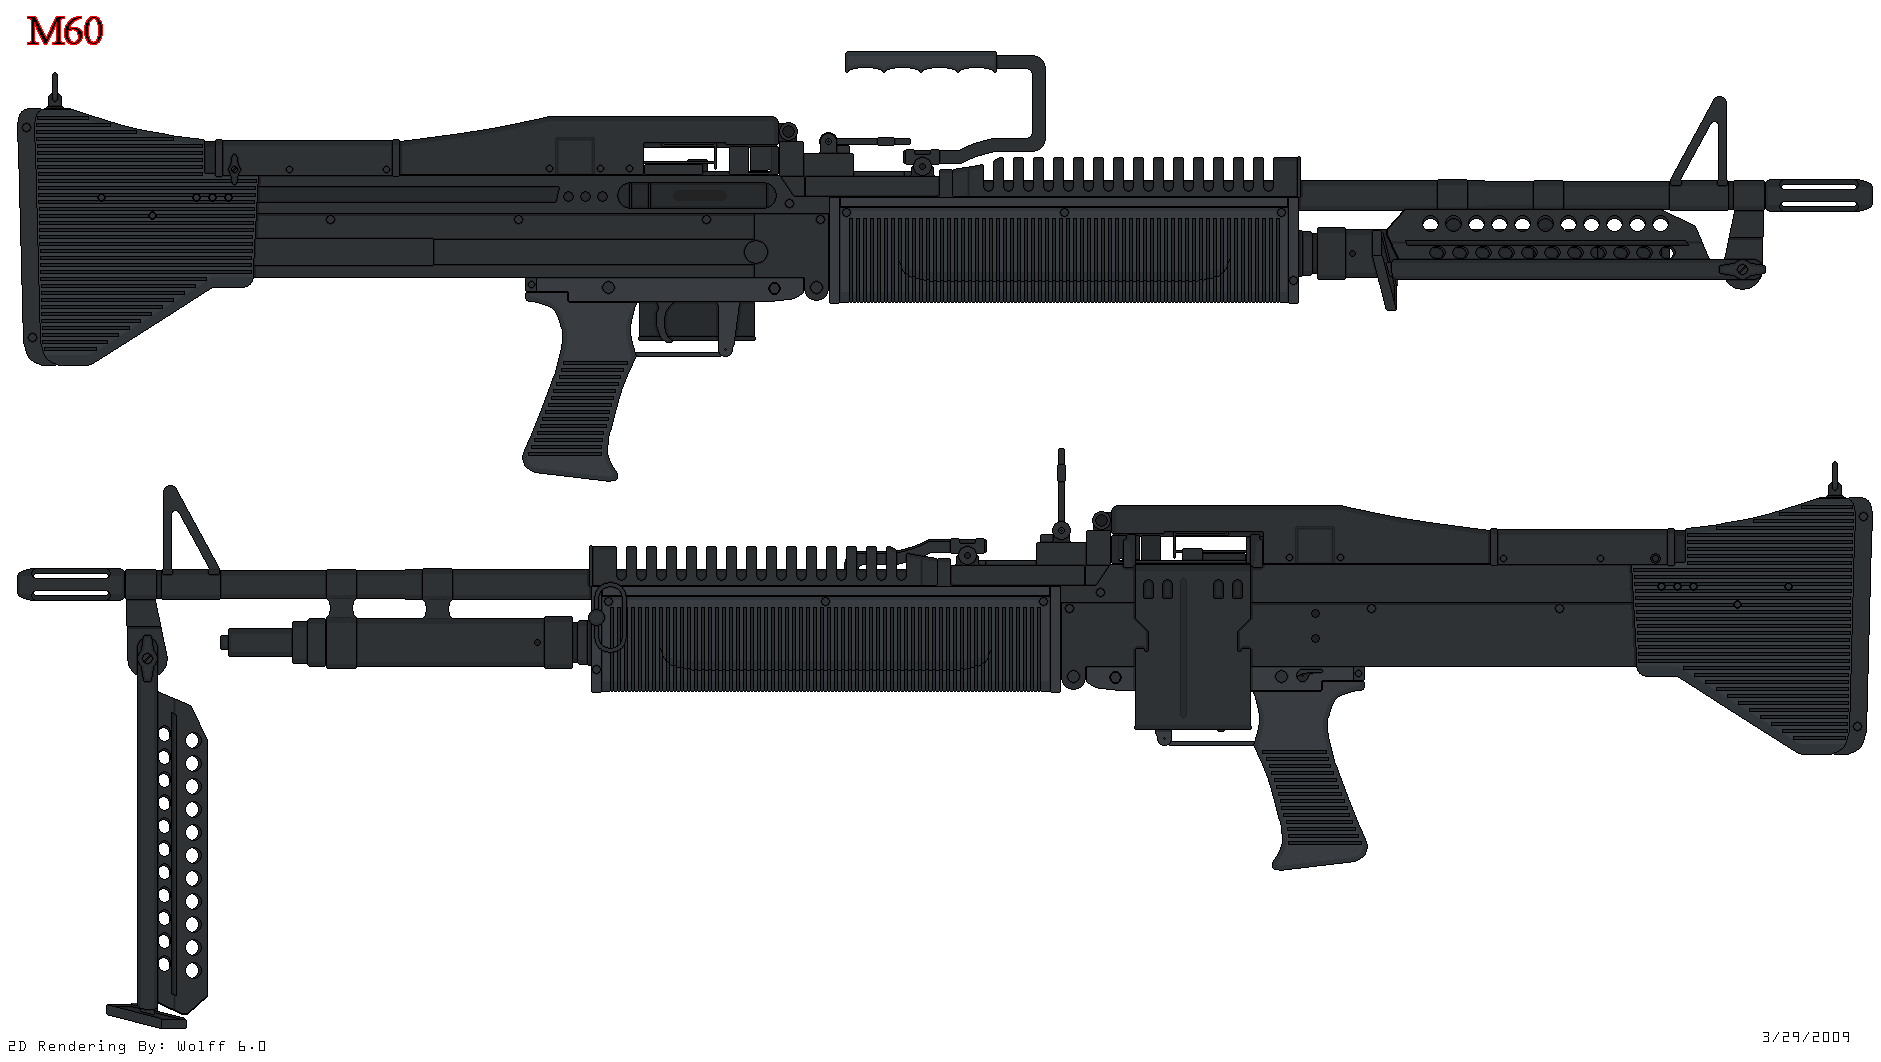 m60 machine gun - photo #11